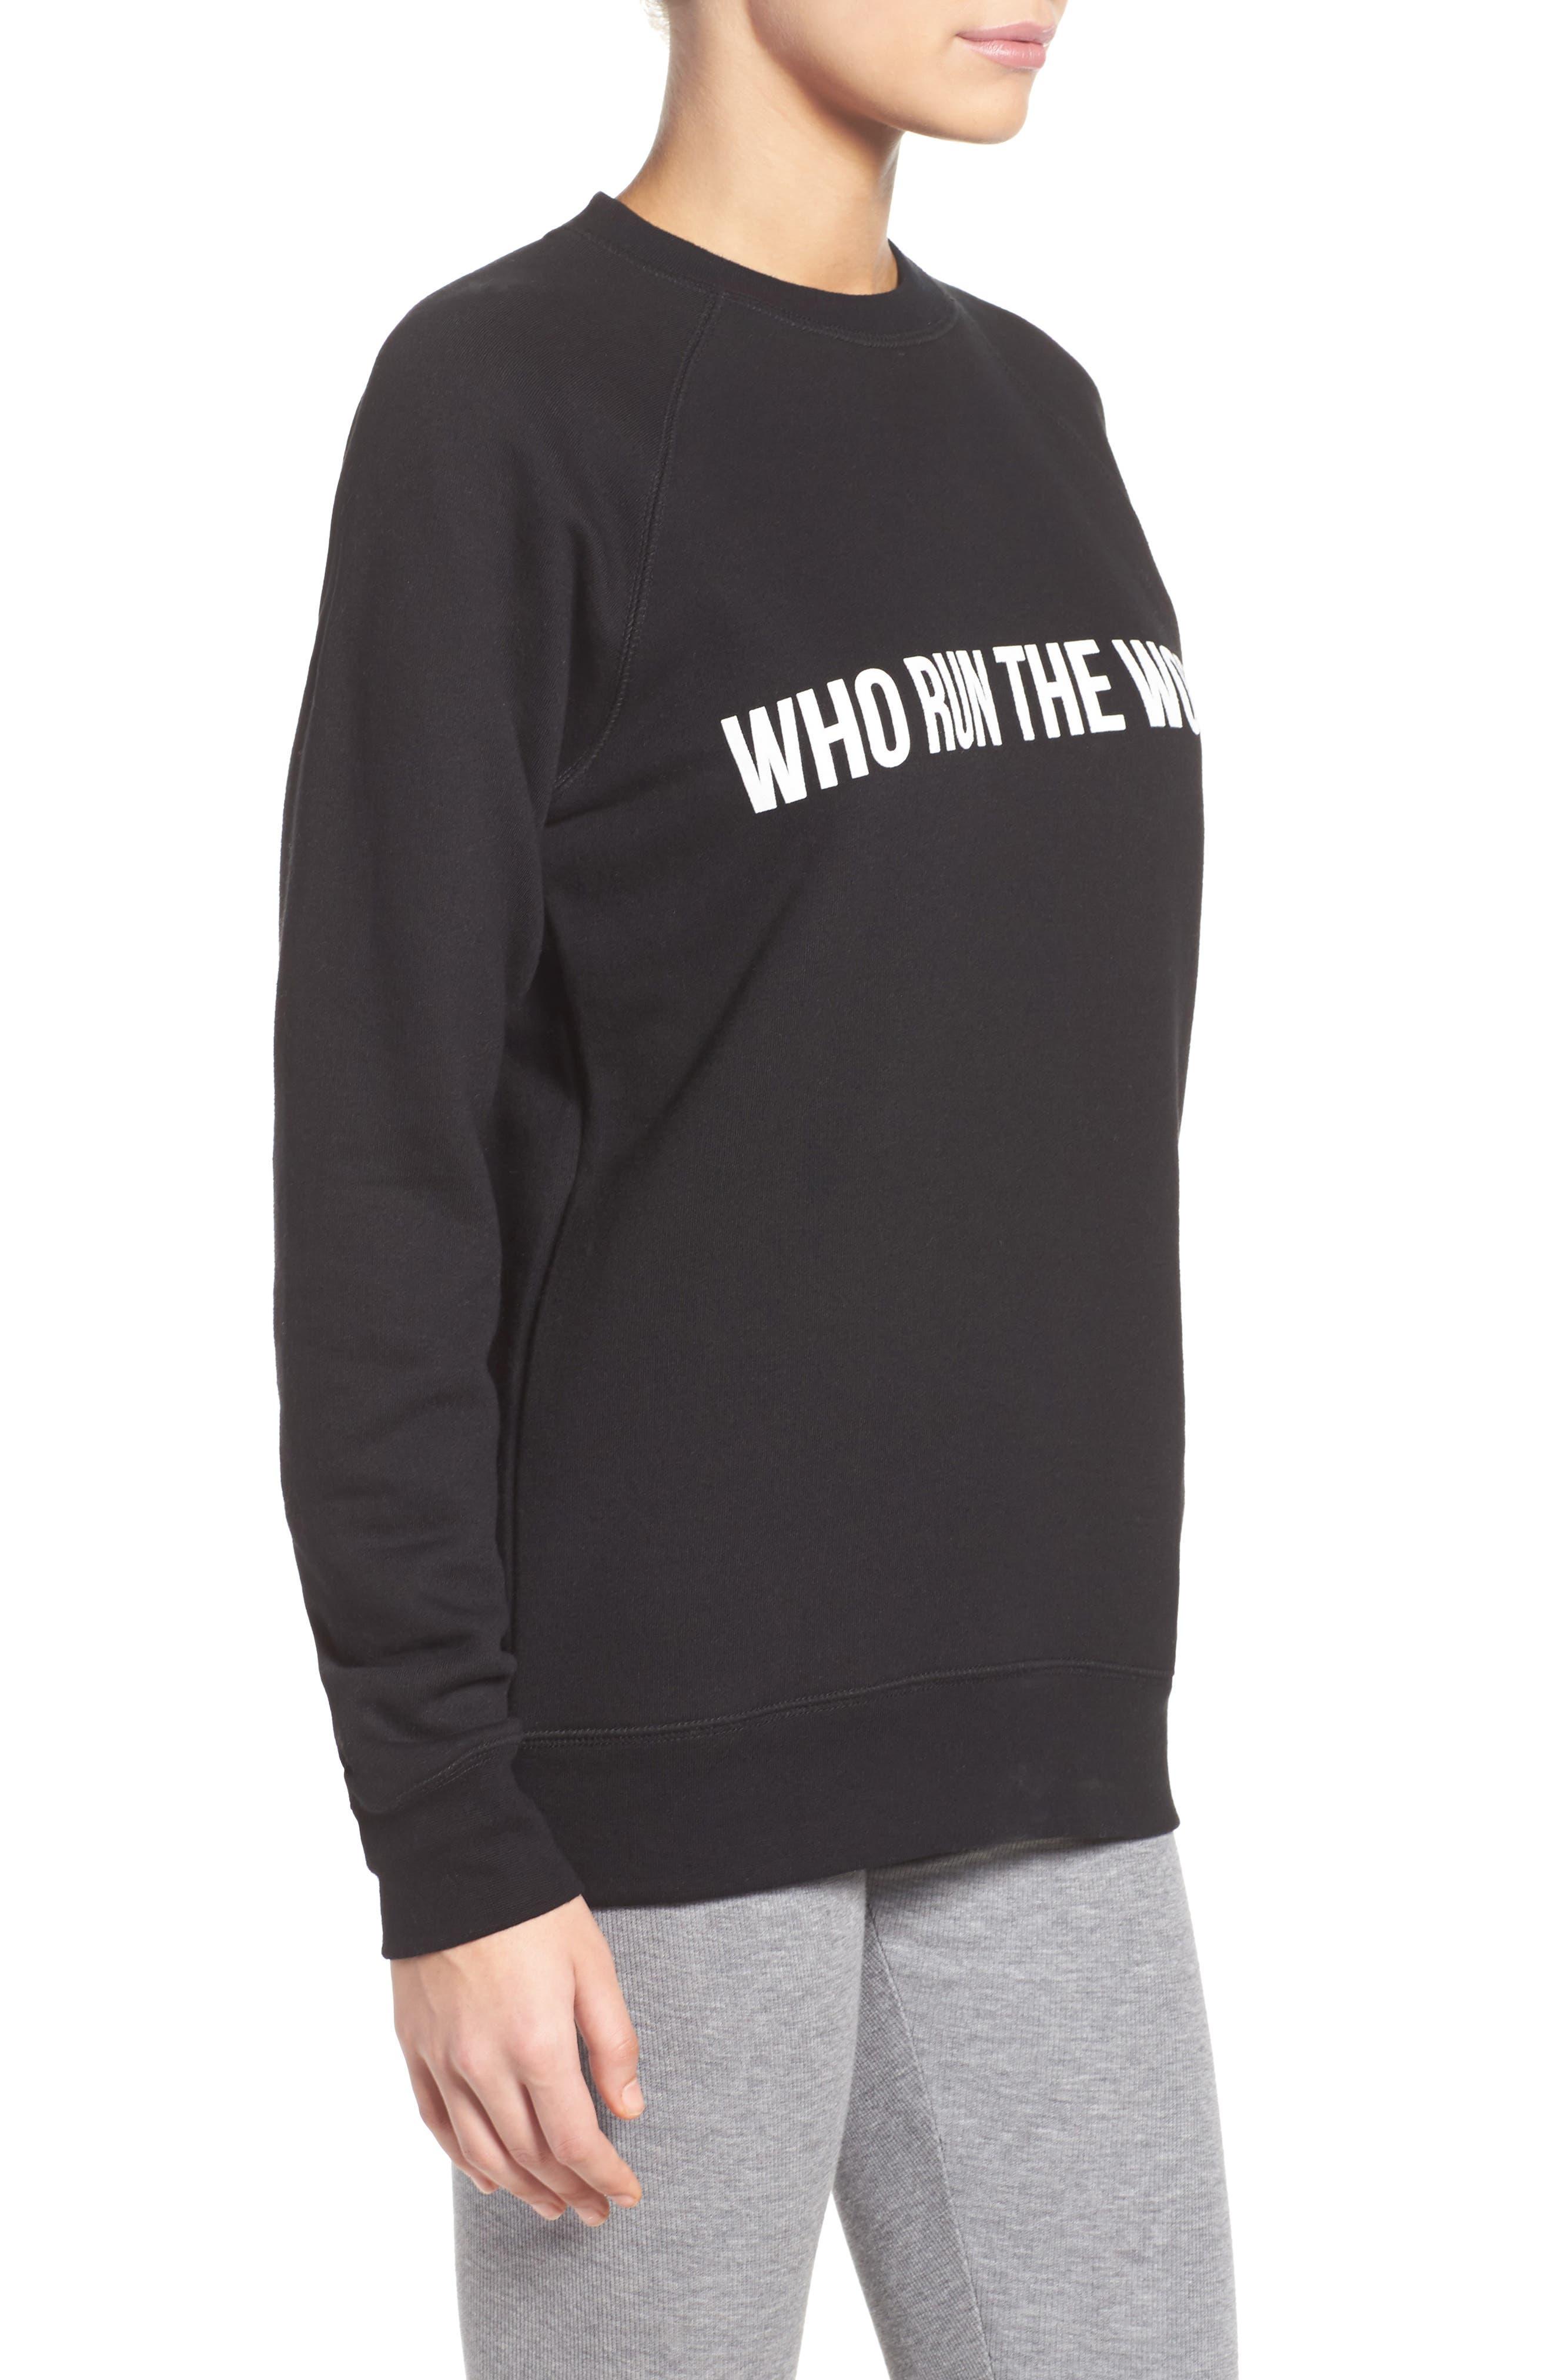 Who Run the World Sweatshirt,                             Alternate thumbnail 3, color,                             001